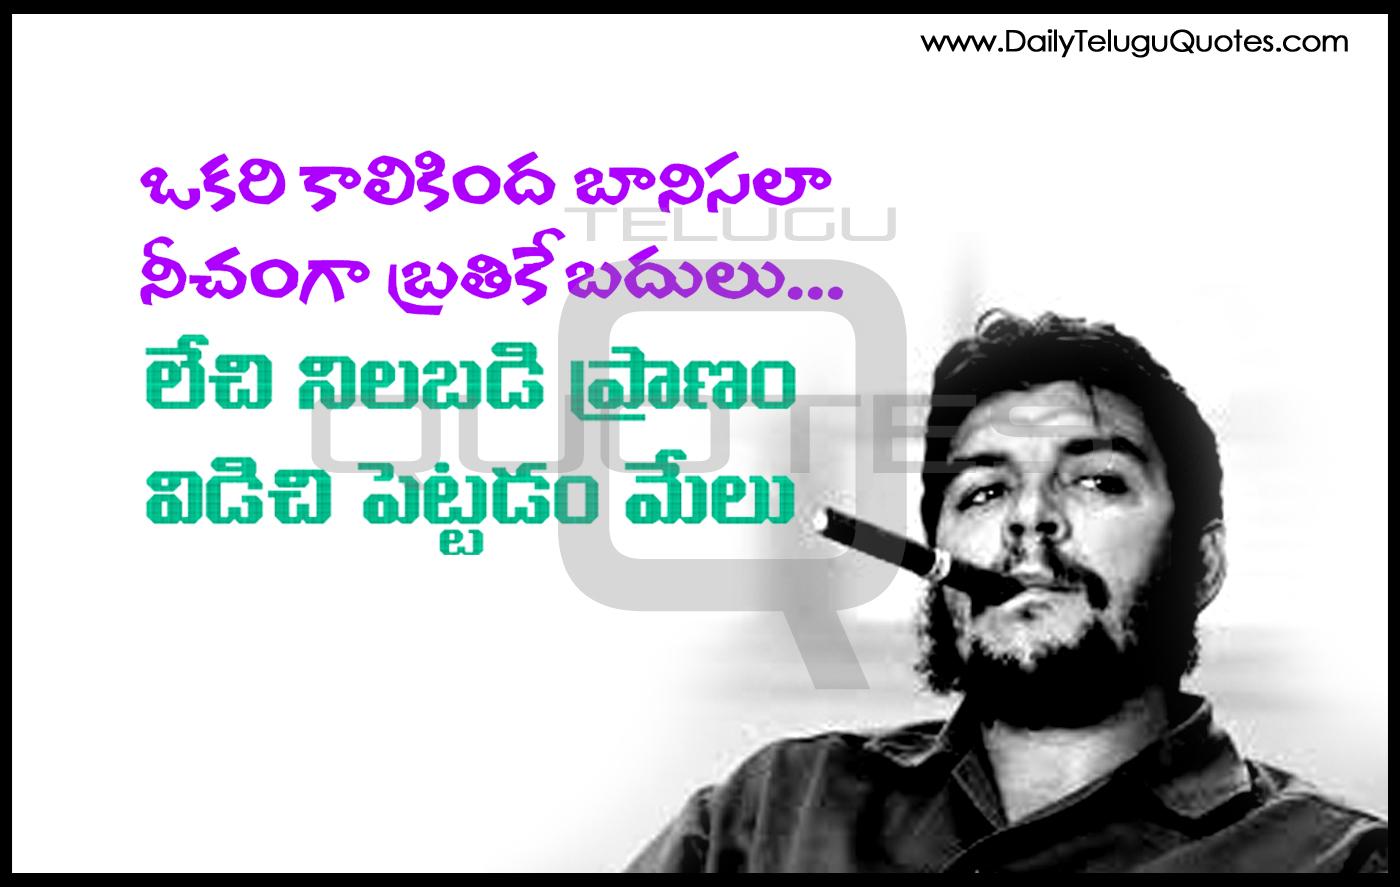 K Che Inspiration che guevara telugu quotes hd wallpapers inspiration quotes in telugu images